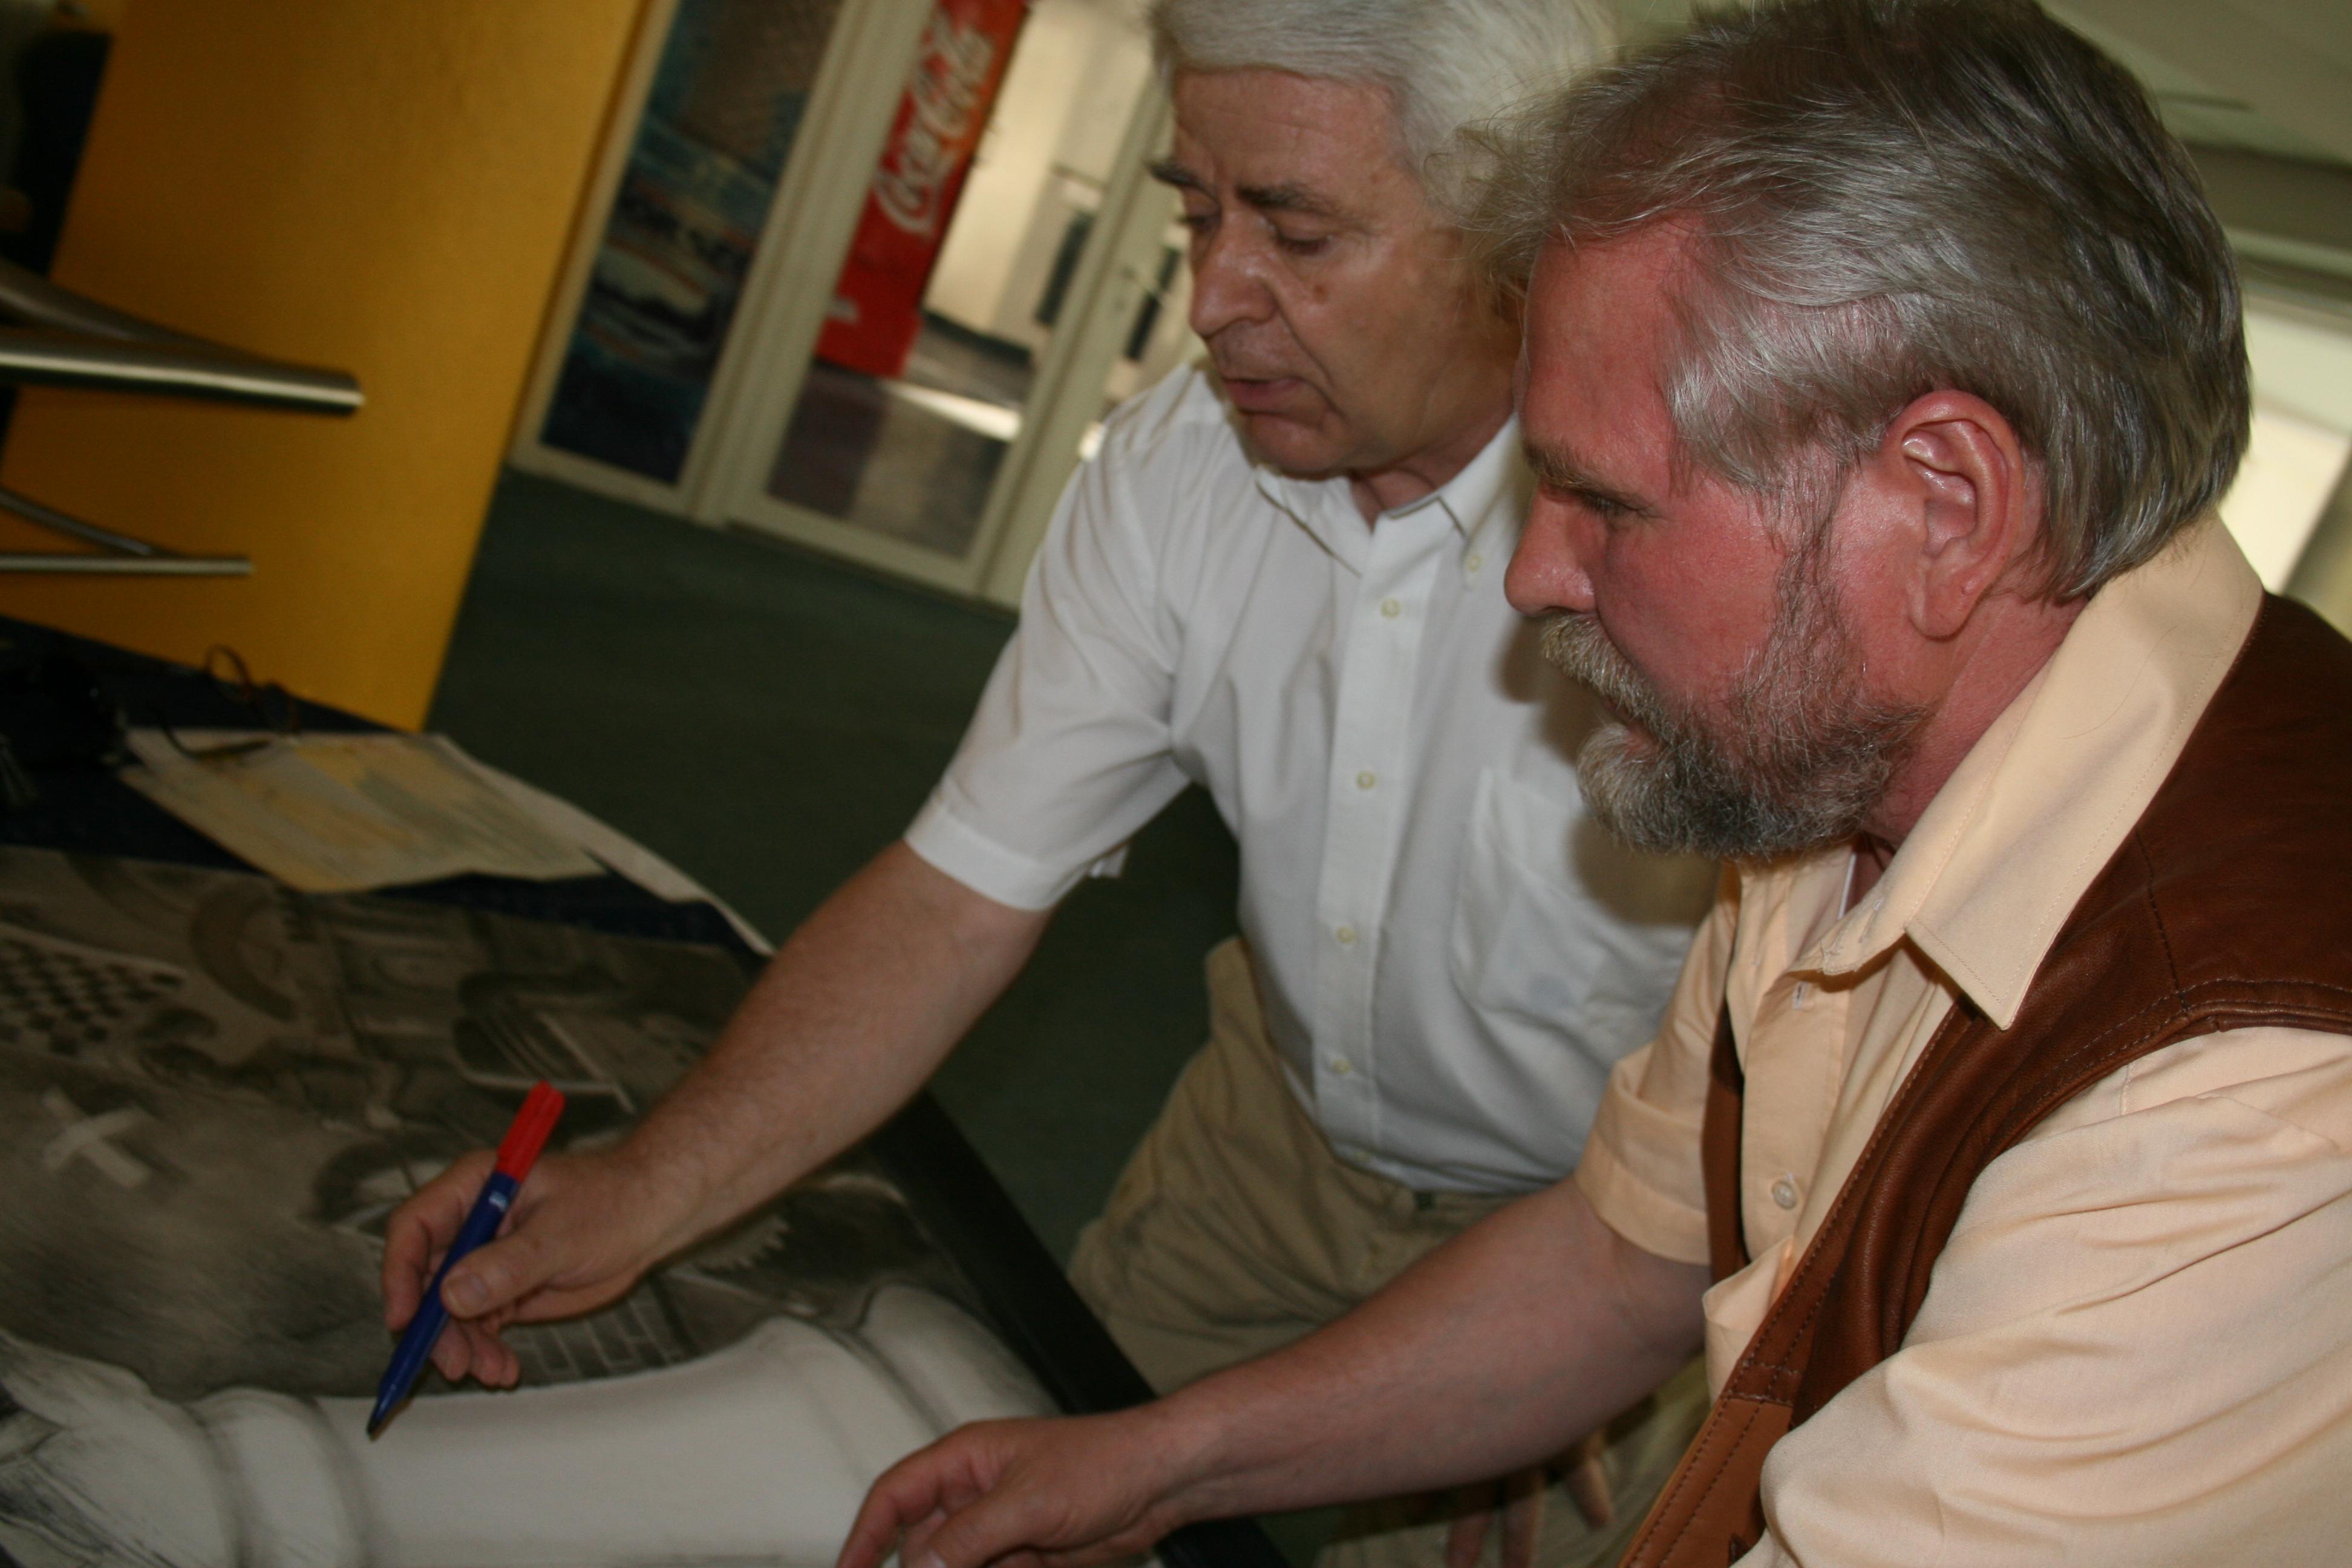 Cu Boris Spassky, 2008